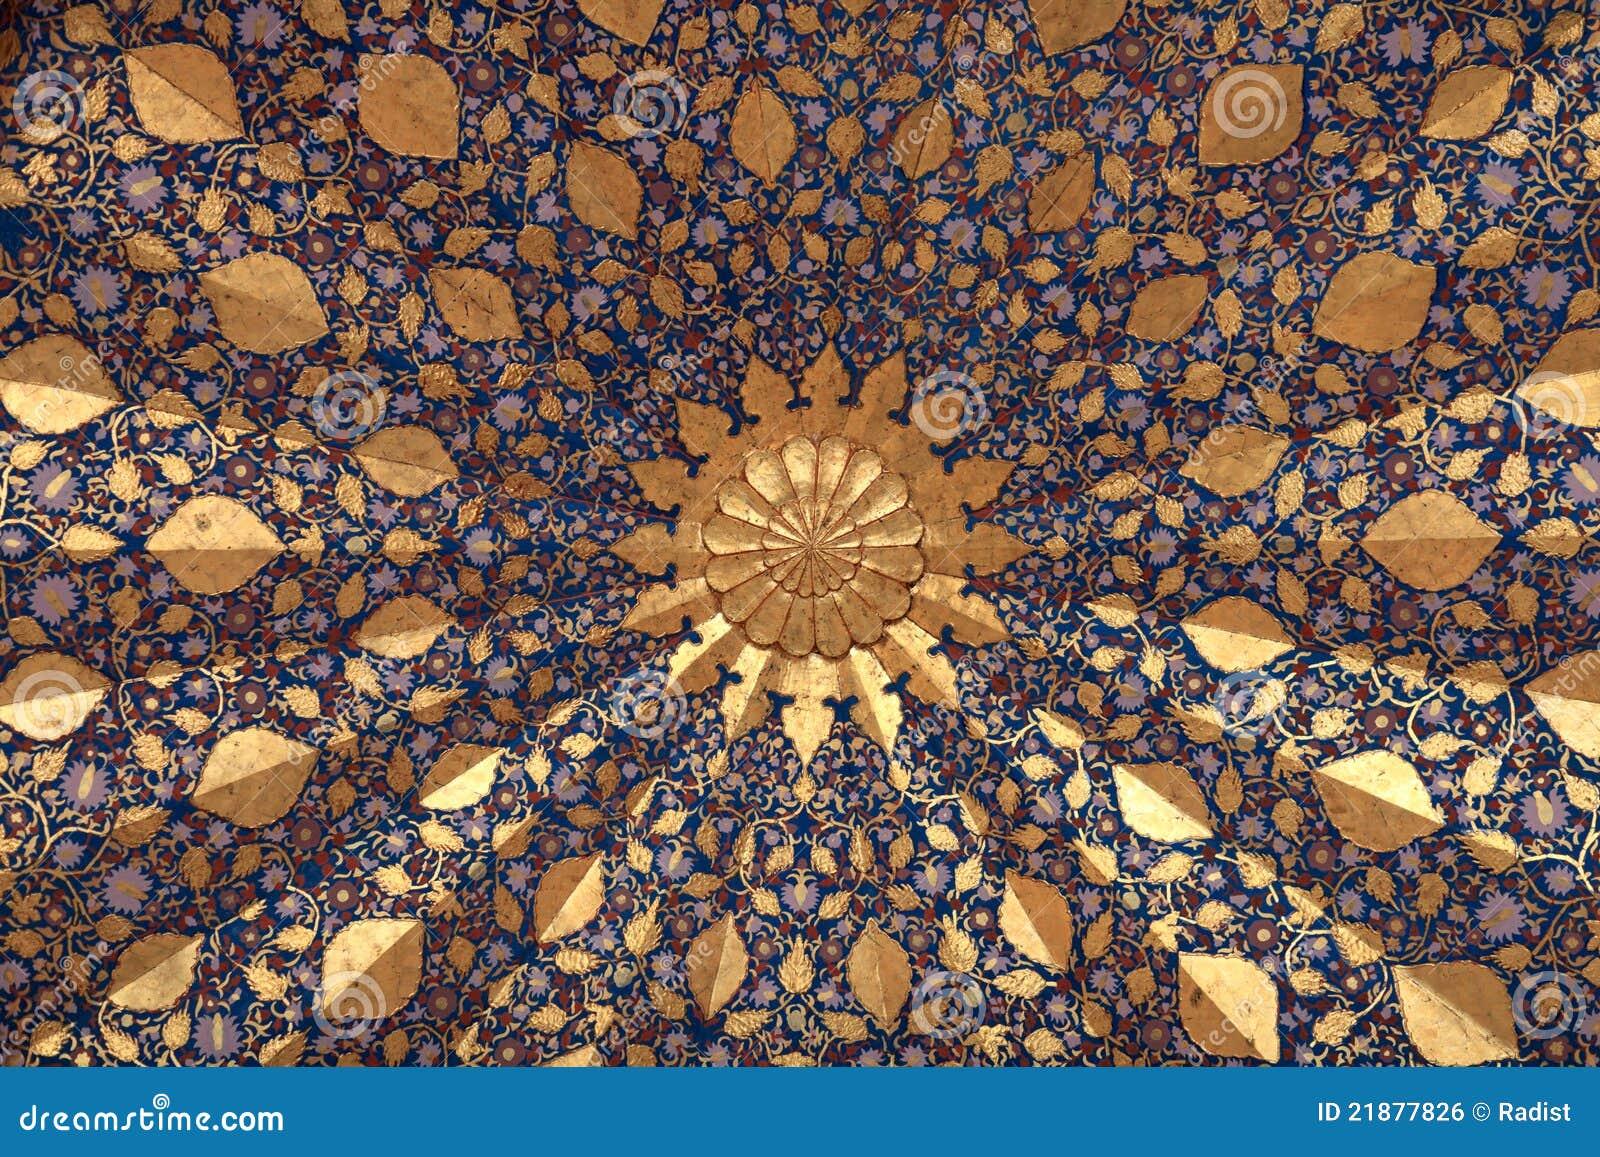 Ceiling Of Aksaray Mausoleum Royalty Free Stock Image - Image ...